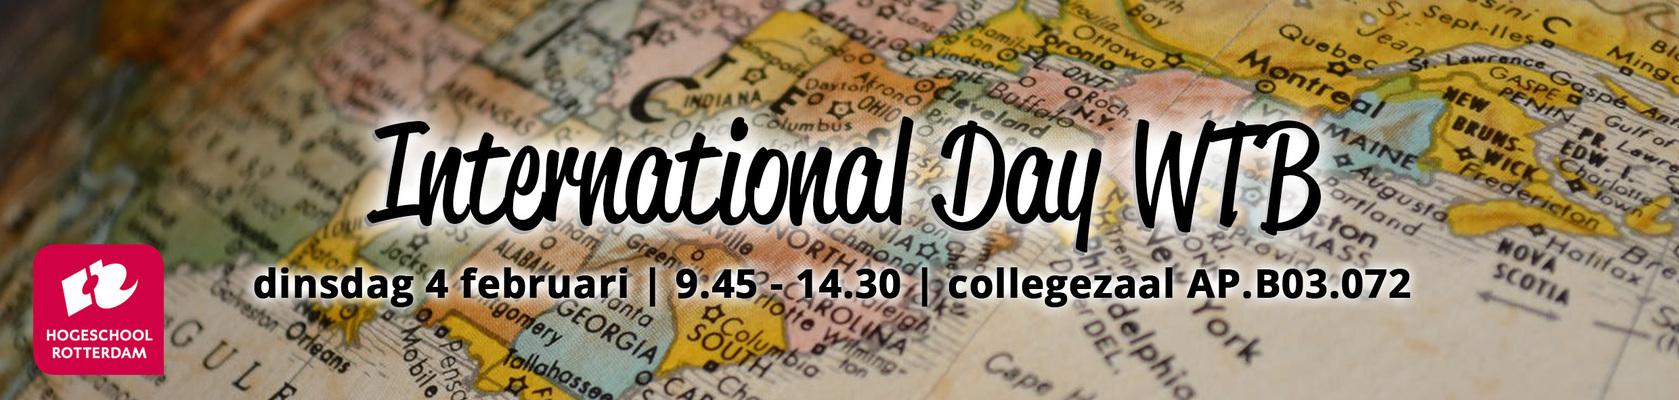 INTERNATIONAL DAY WTB